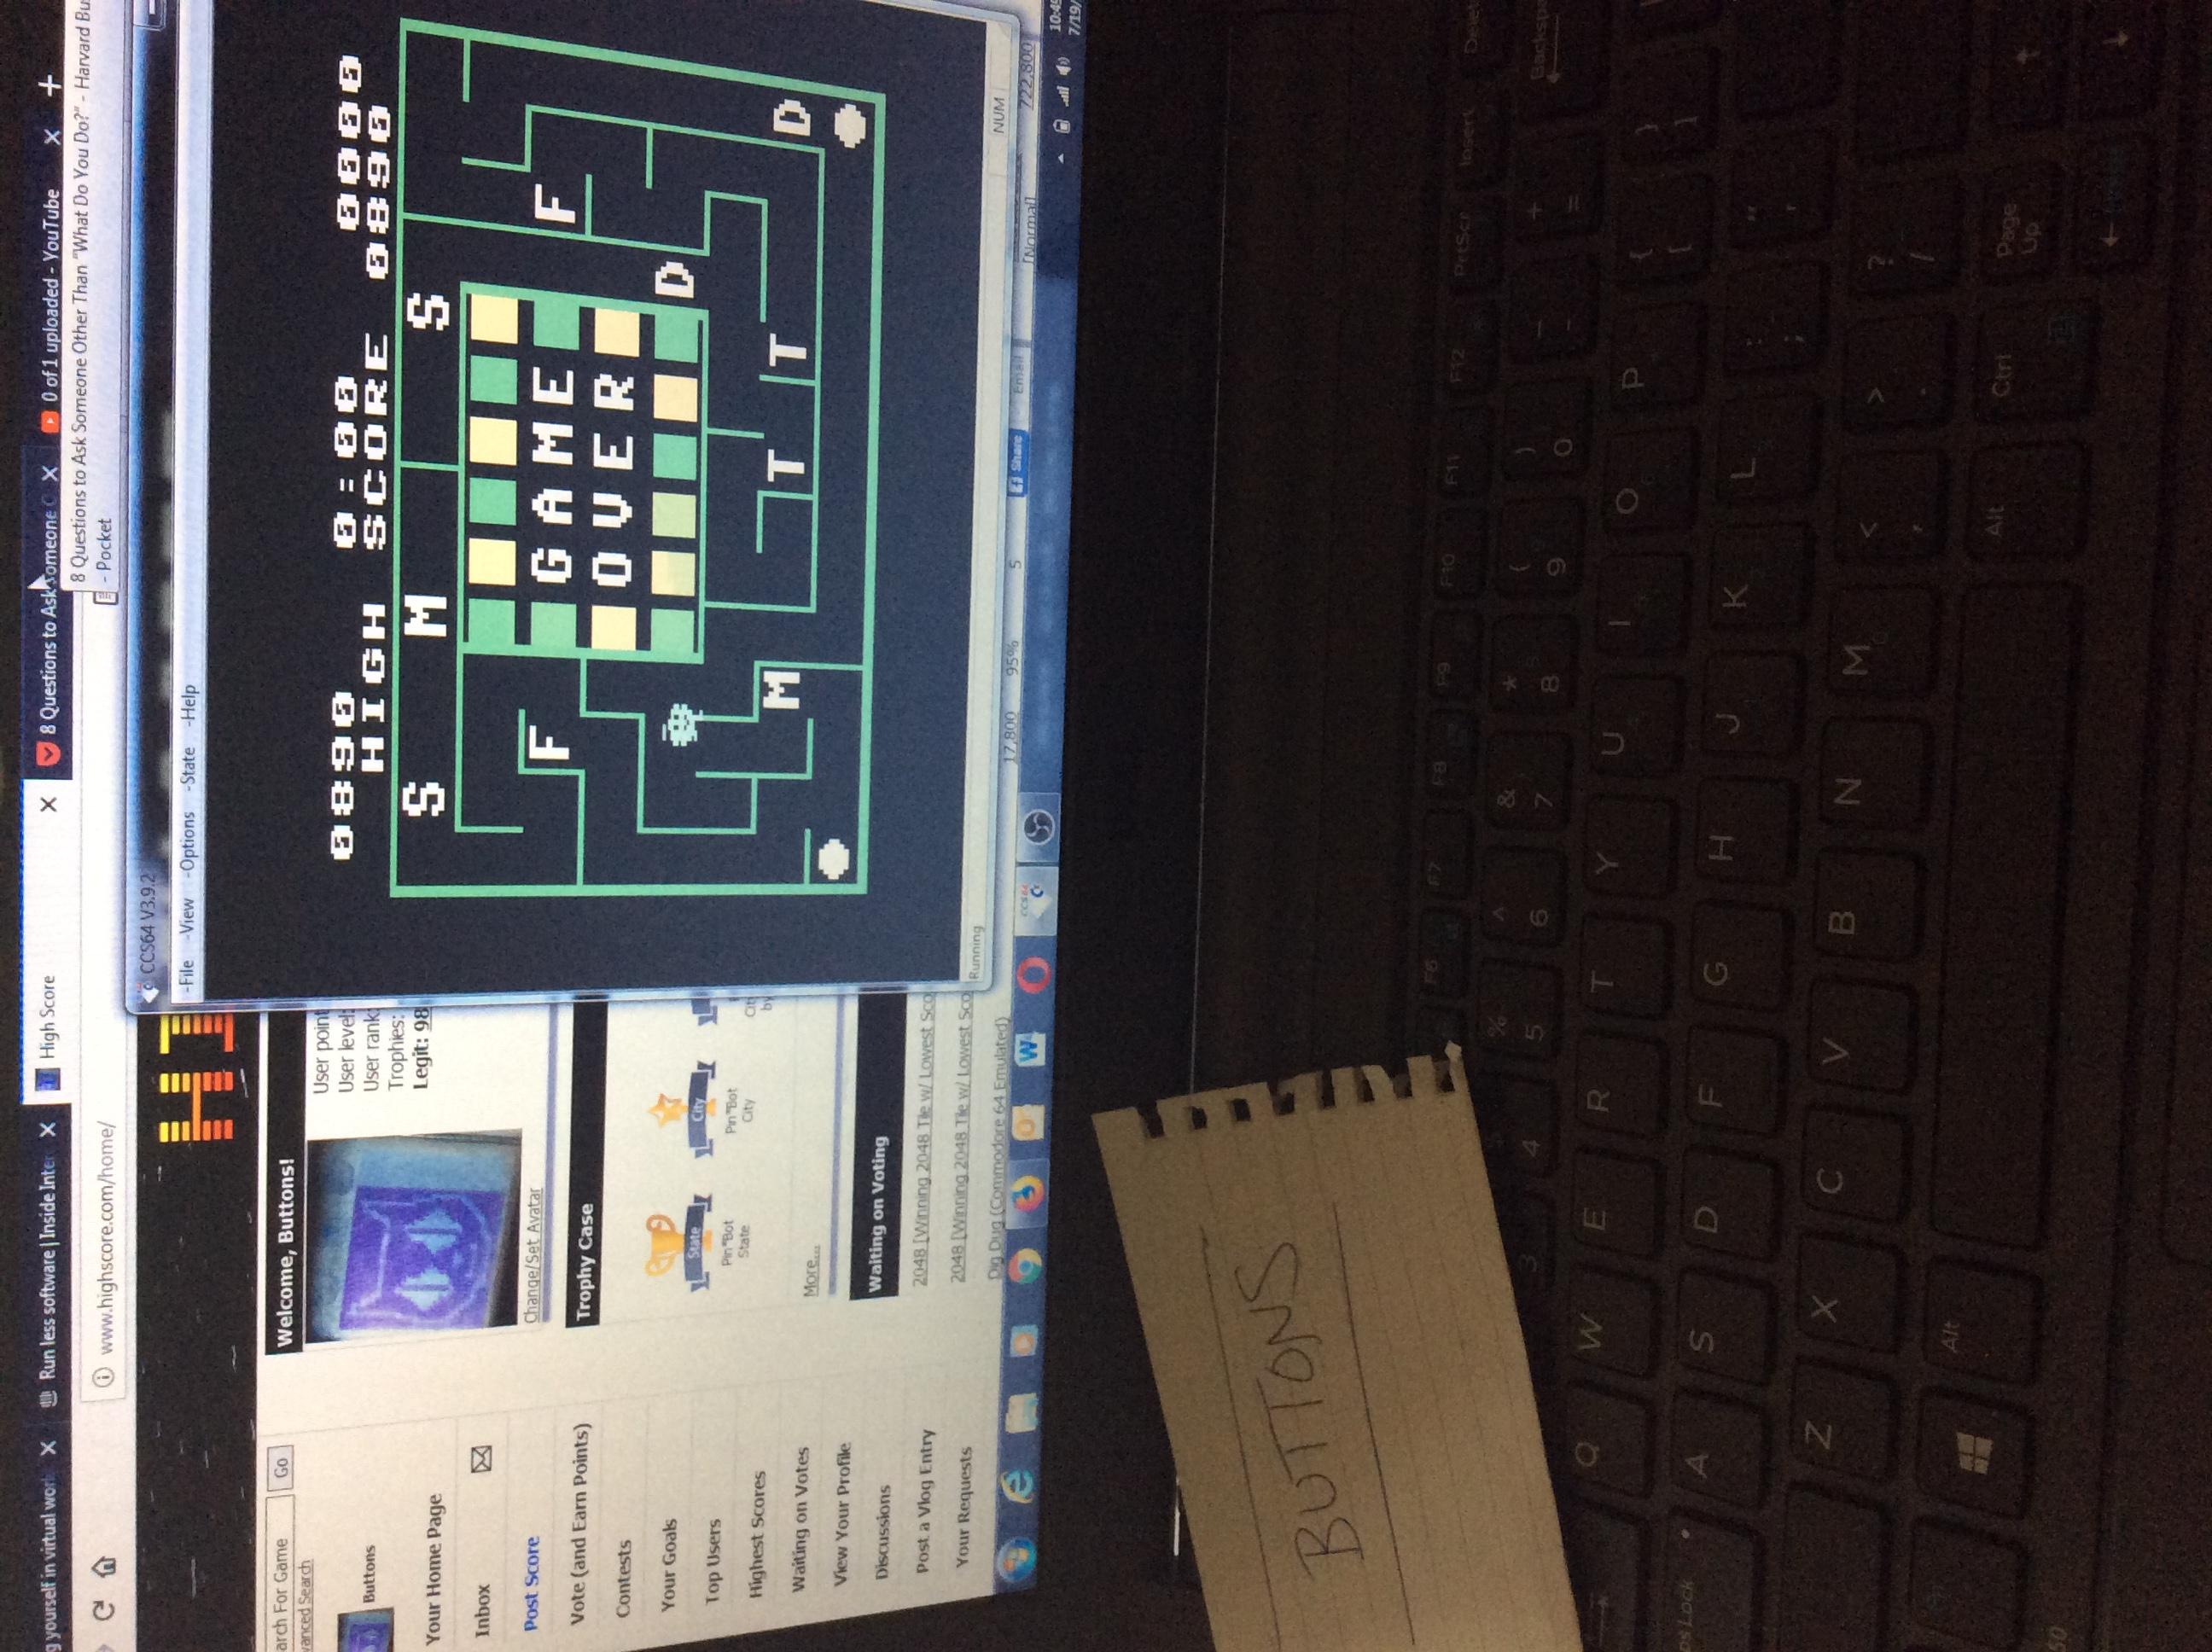 Alphabet Zoo [Level 4 / Game 1 / Uppercase] 890 points